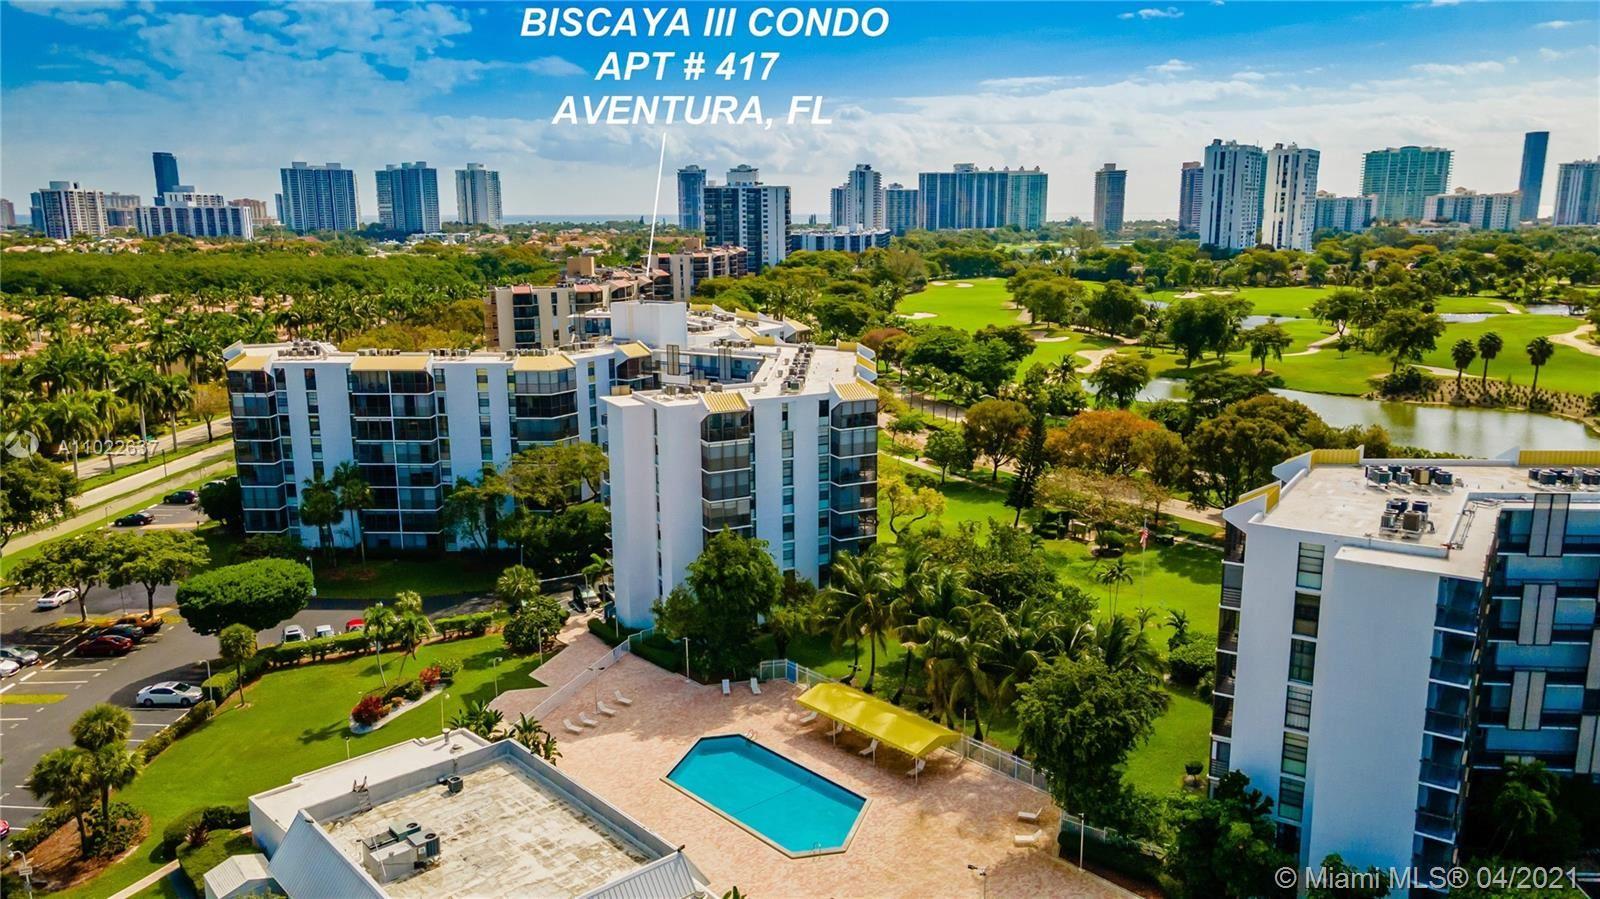 20500 W Country Club Dr #417, Aventura, FL 33180 - #: A11022637